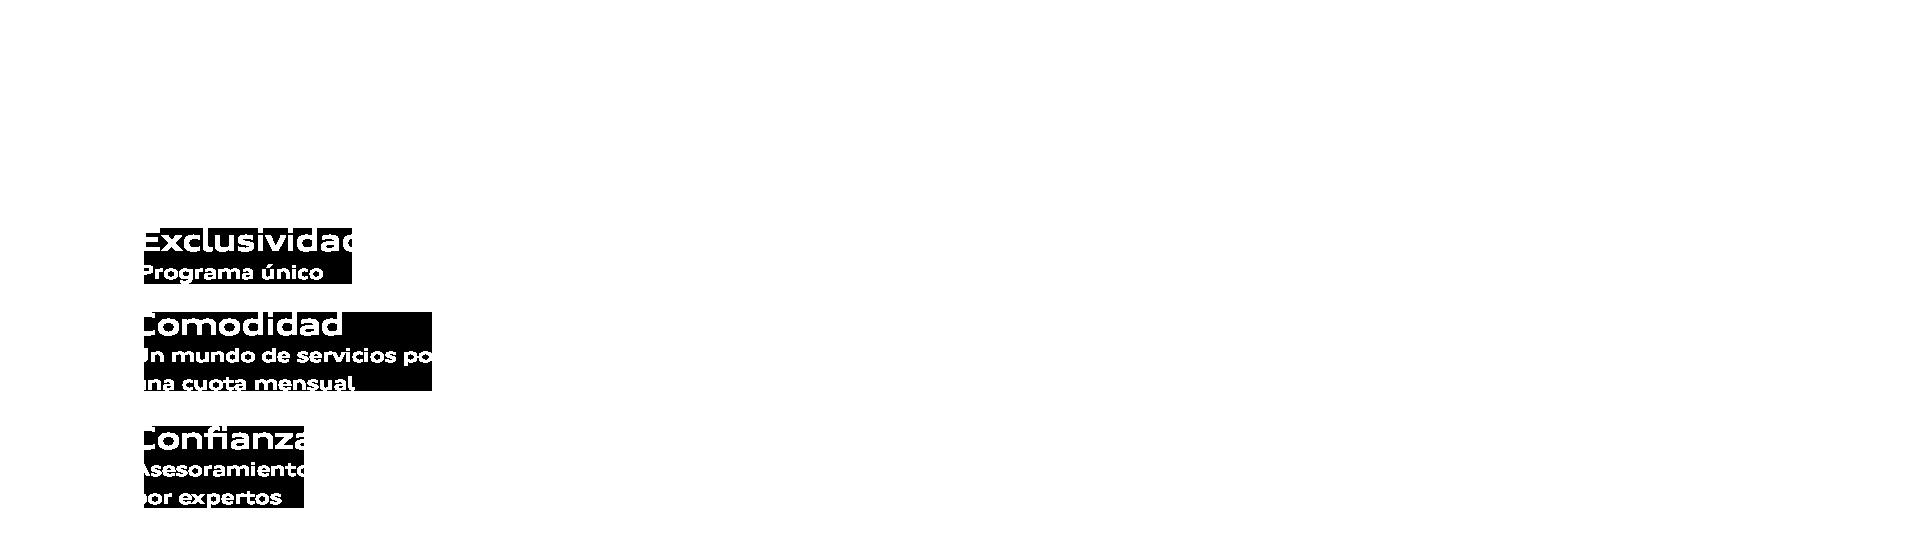 texto-cabecera-fulldrive